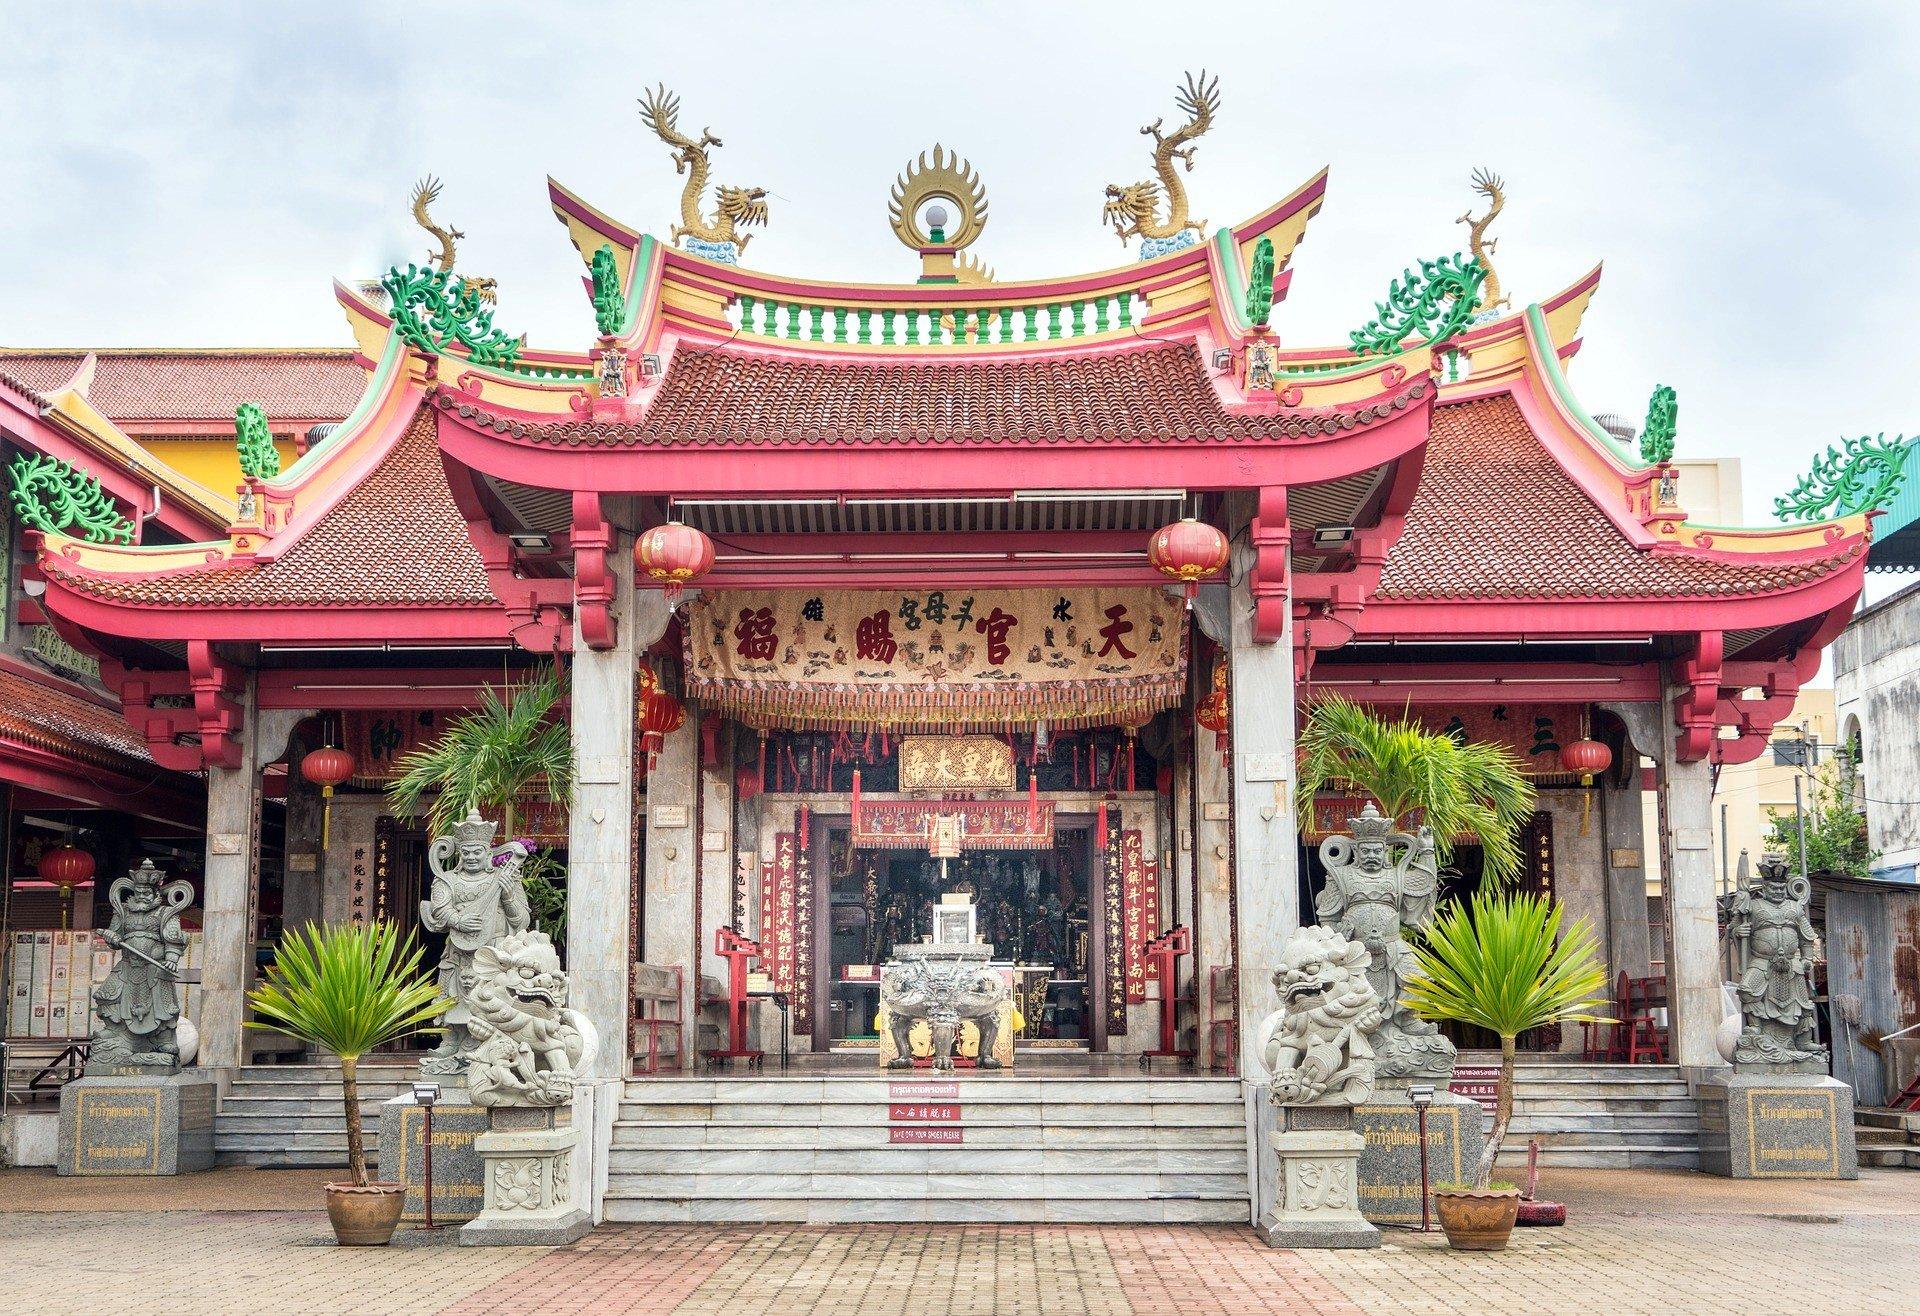 Jui Tui Tao Bo Keang Temple in Phuket